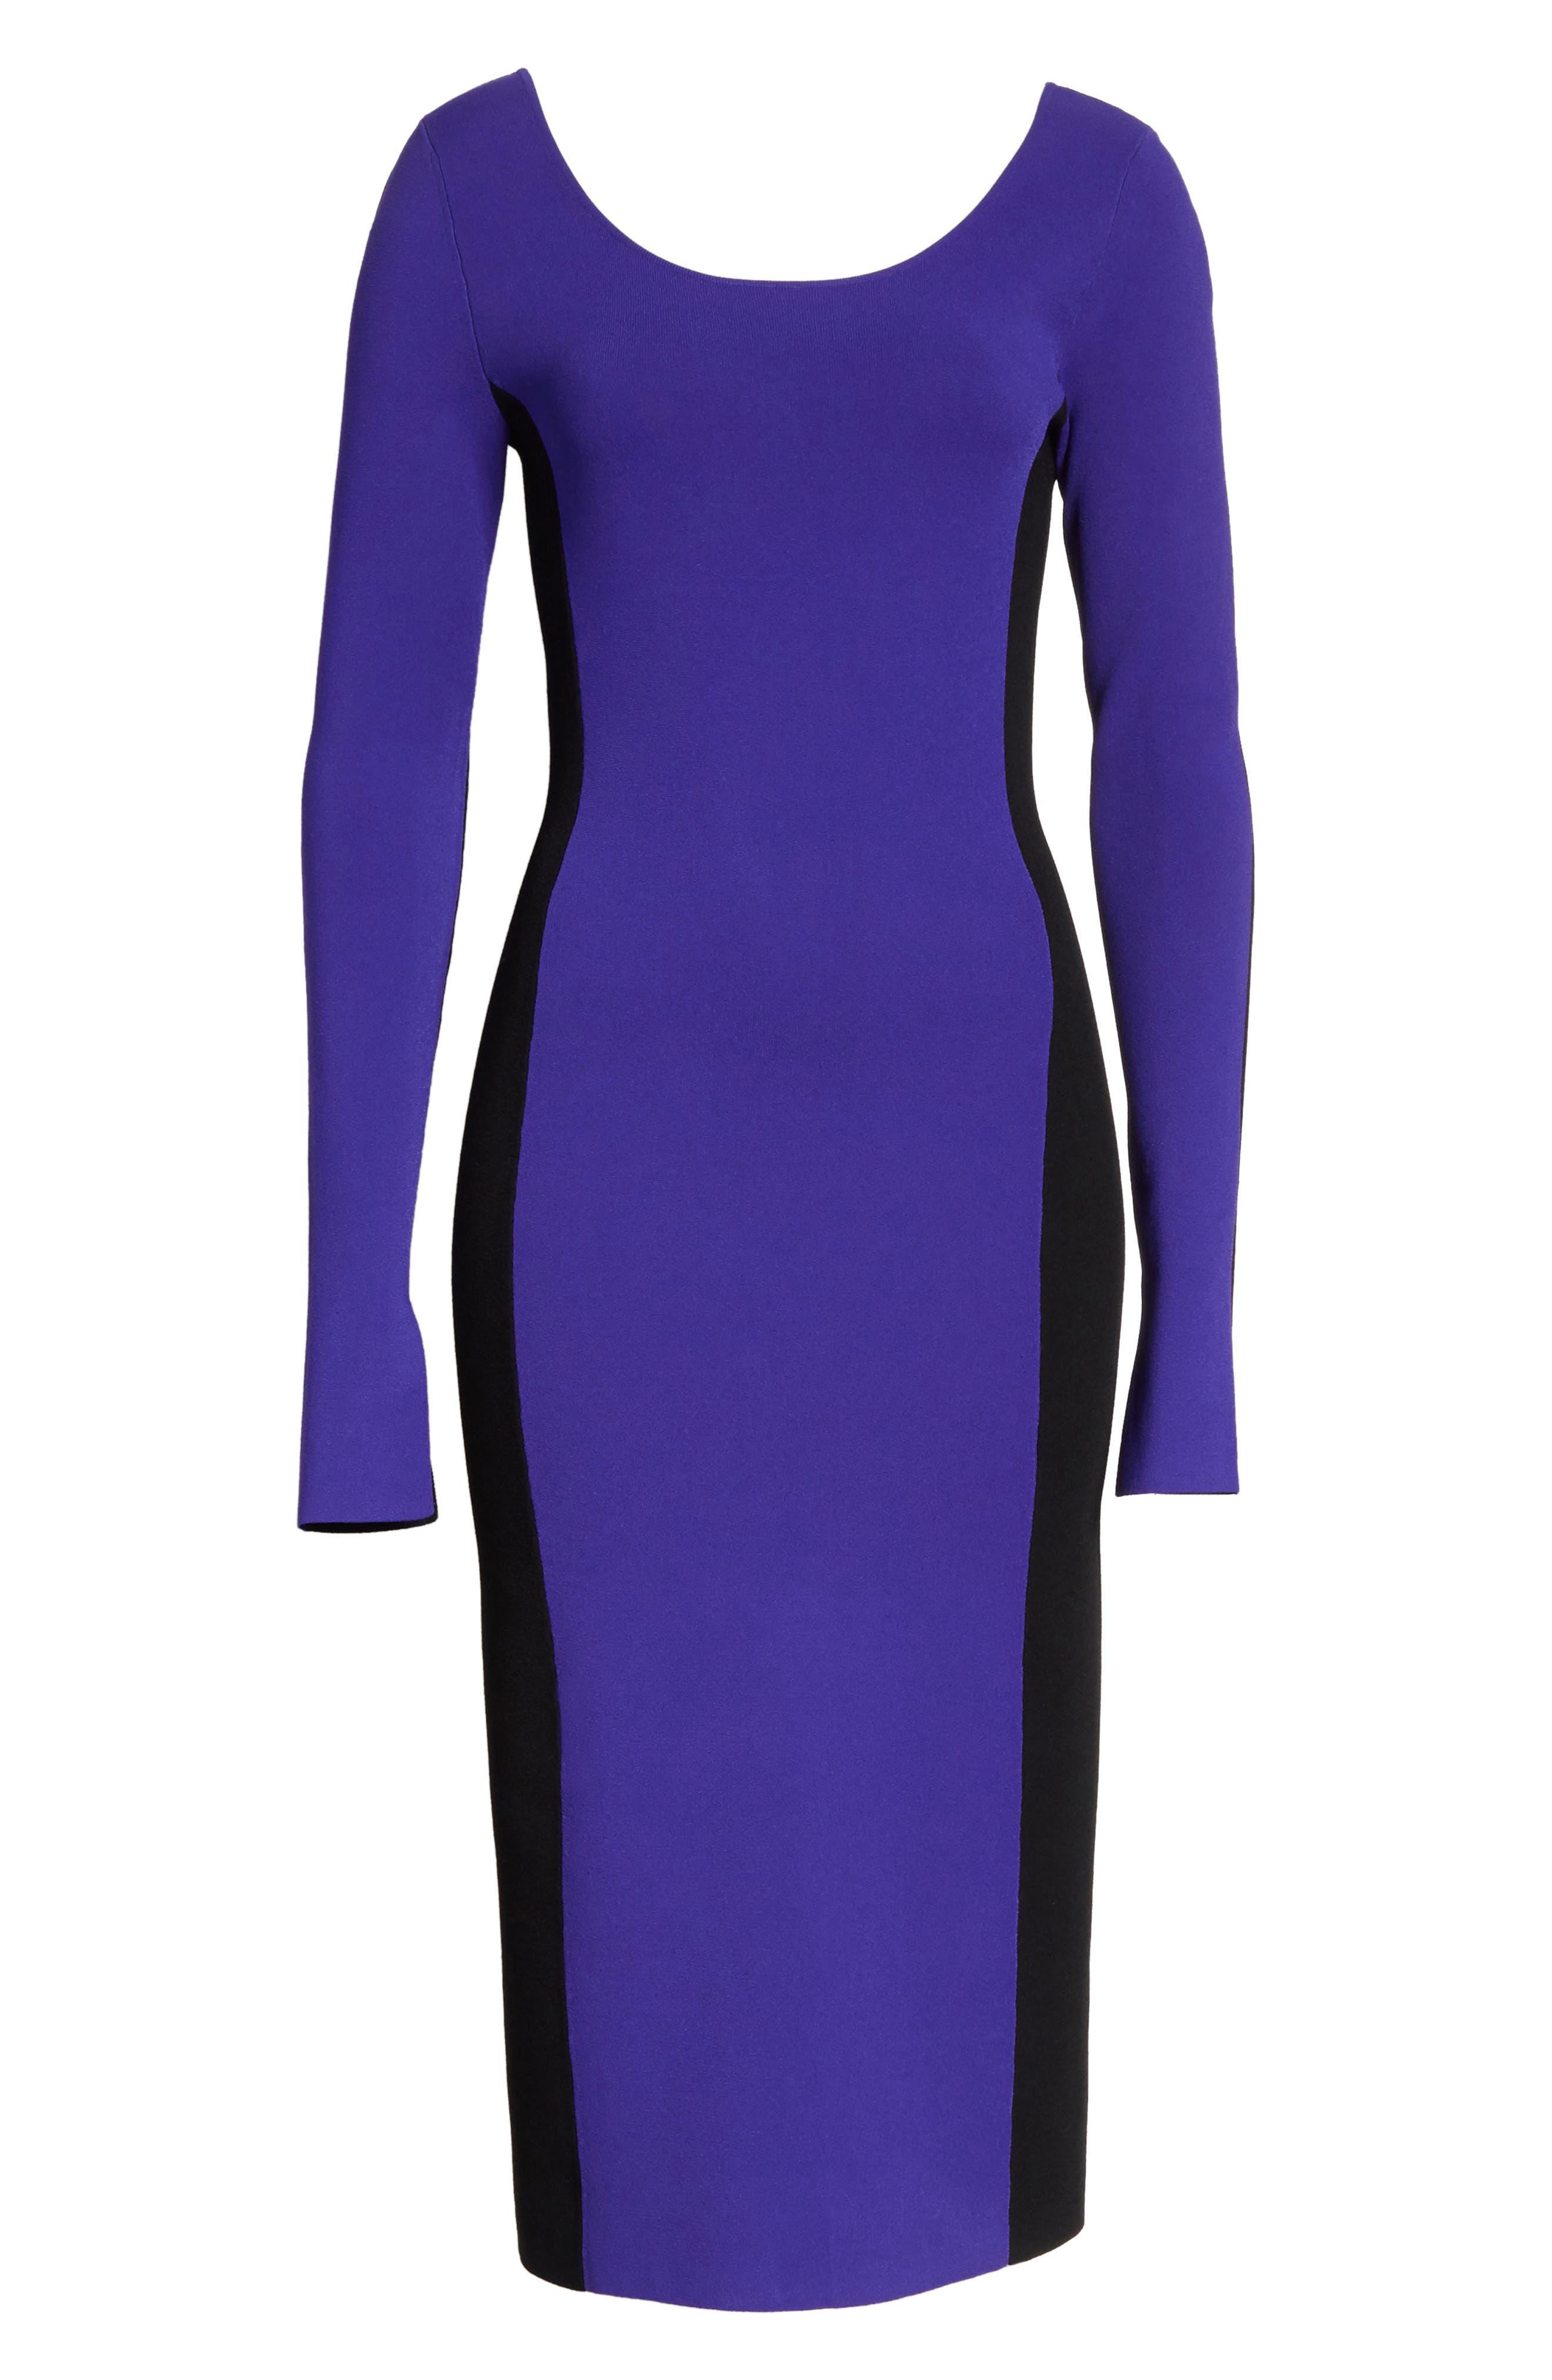 Colorblock Knit Body-Con Dress,                             Alternate thumbnail 6, color,                             Electric Blue/ Black